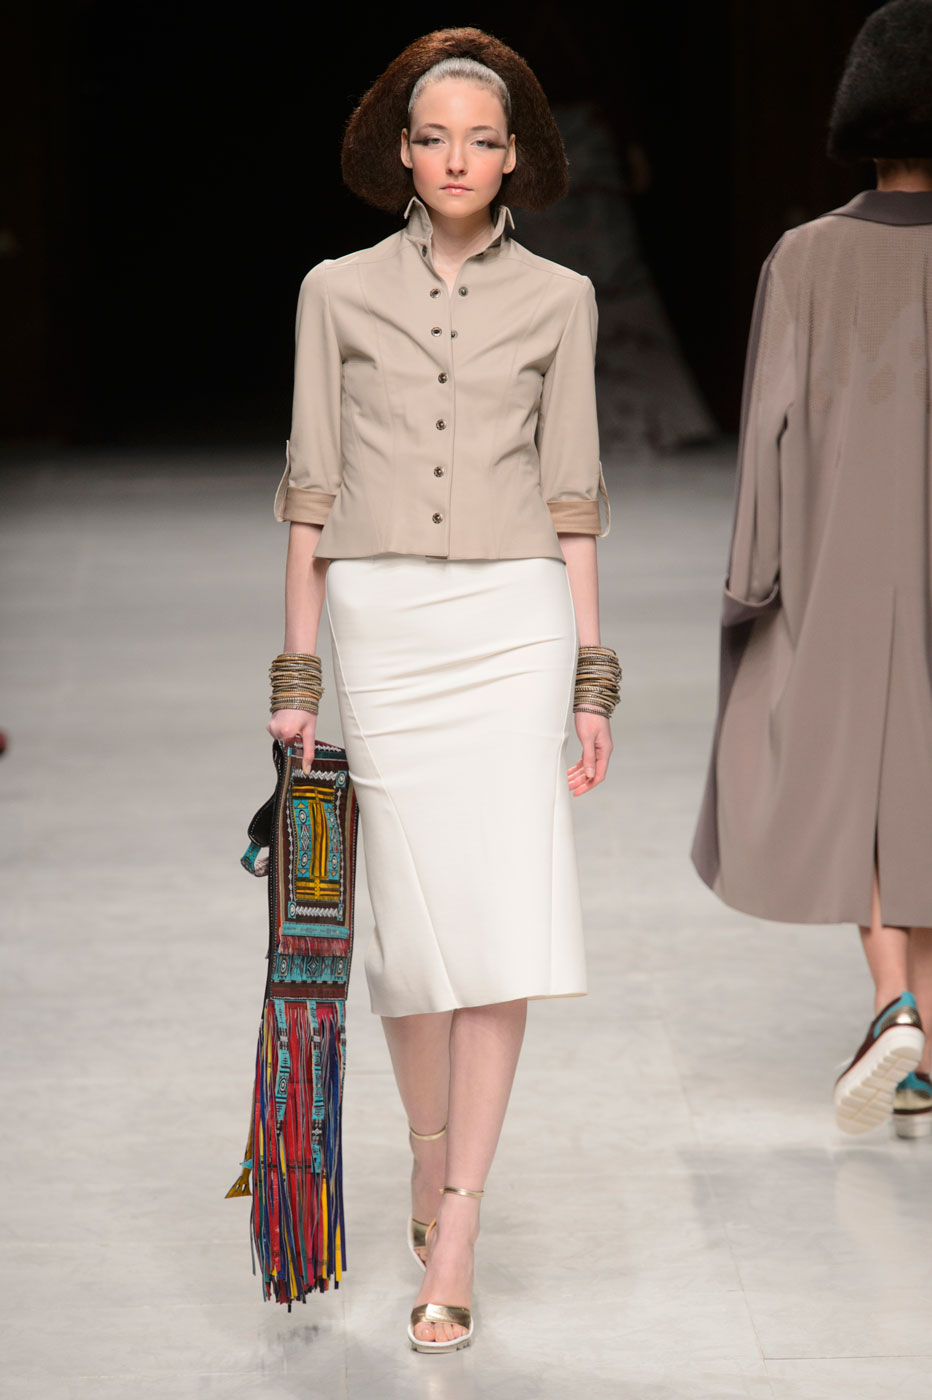 Julien-Fournie-Prive-fashion-runway-show-haute-couture-paris-spring-2015-the-impression-14